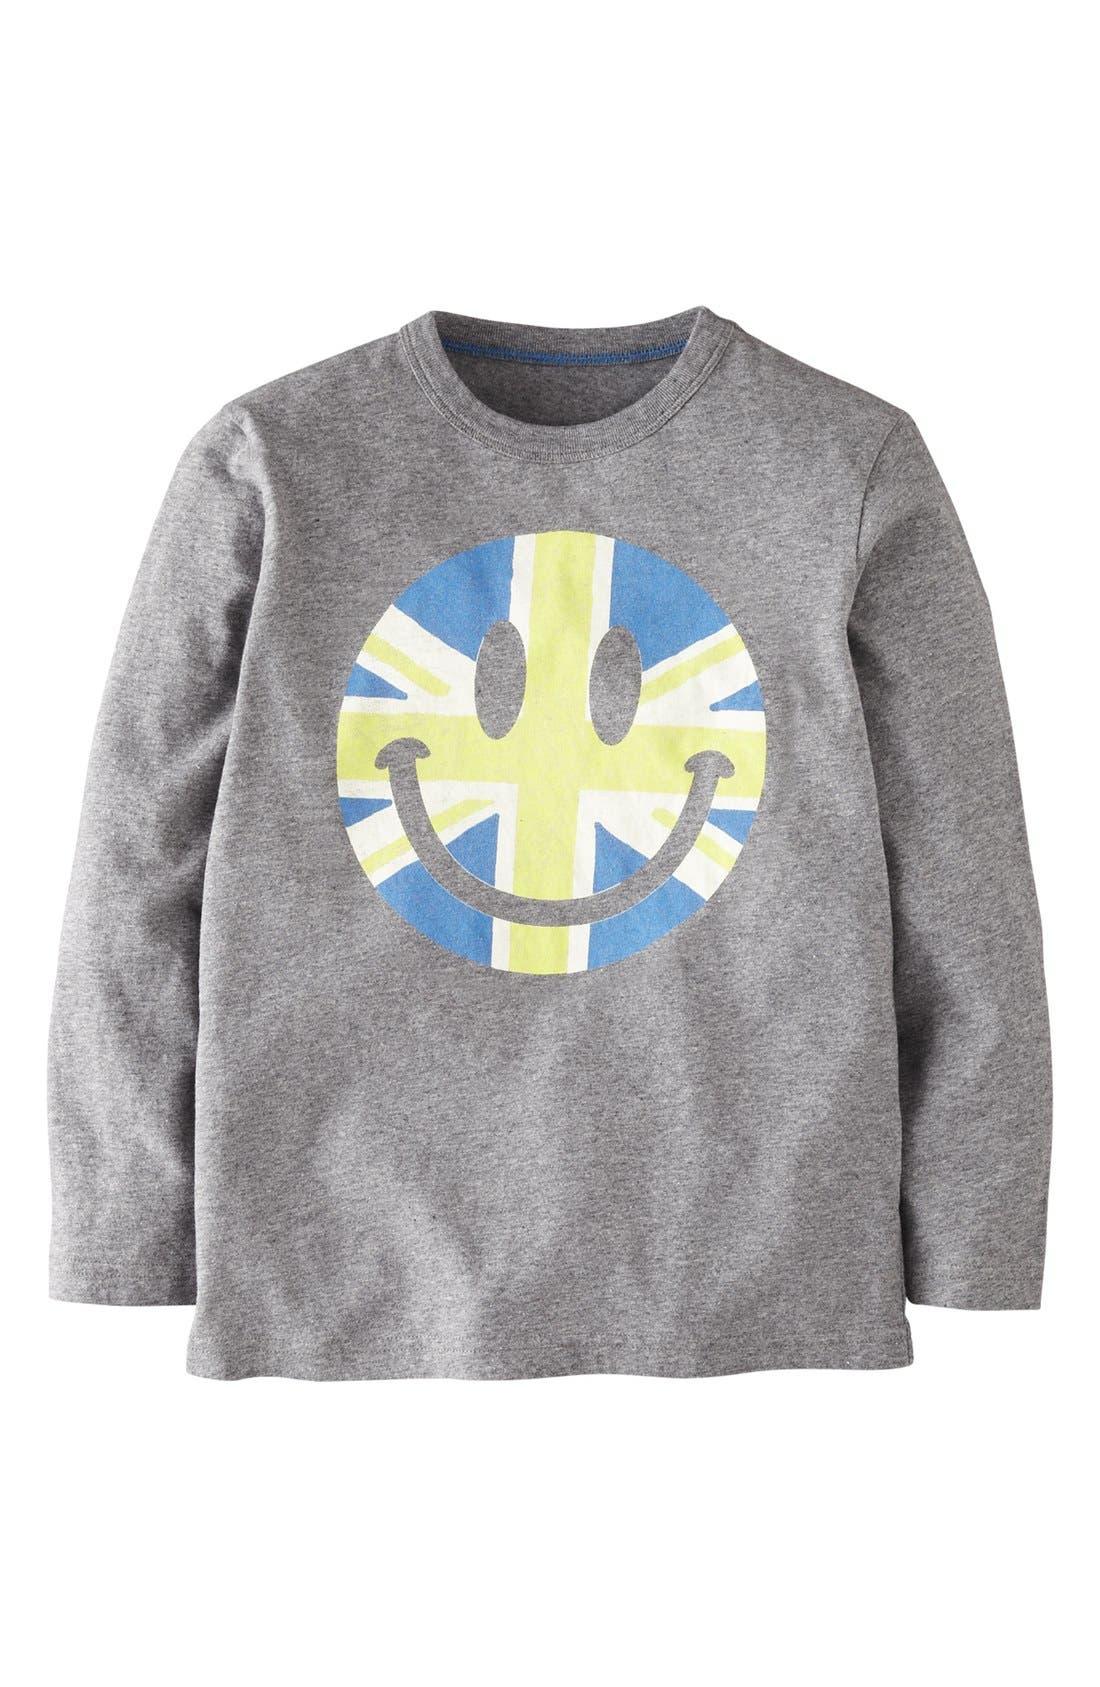 Alternate Image 1 Selected - Mini Boden Screenprint T-Shirt (Toddler Boys)